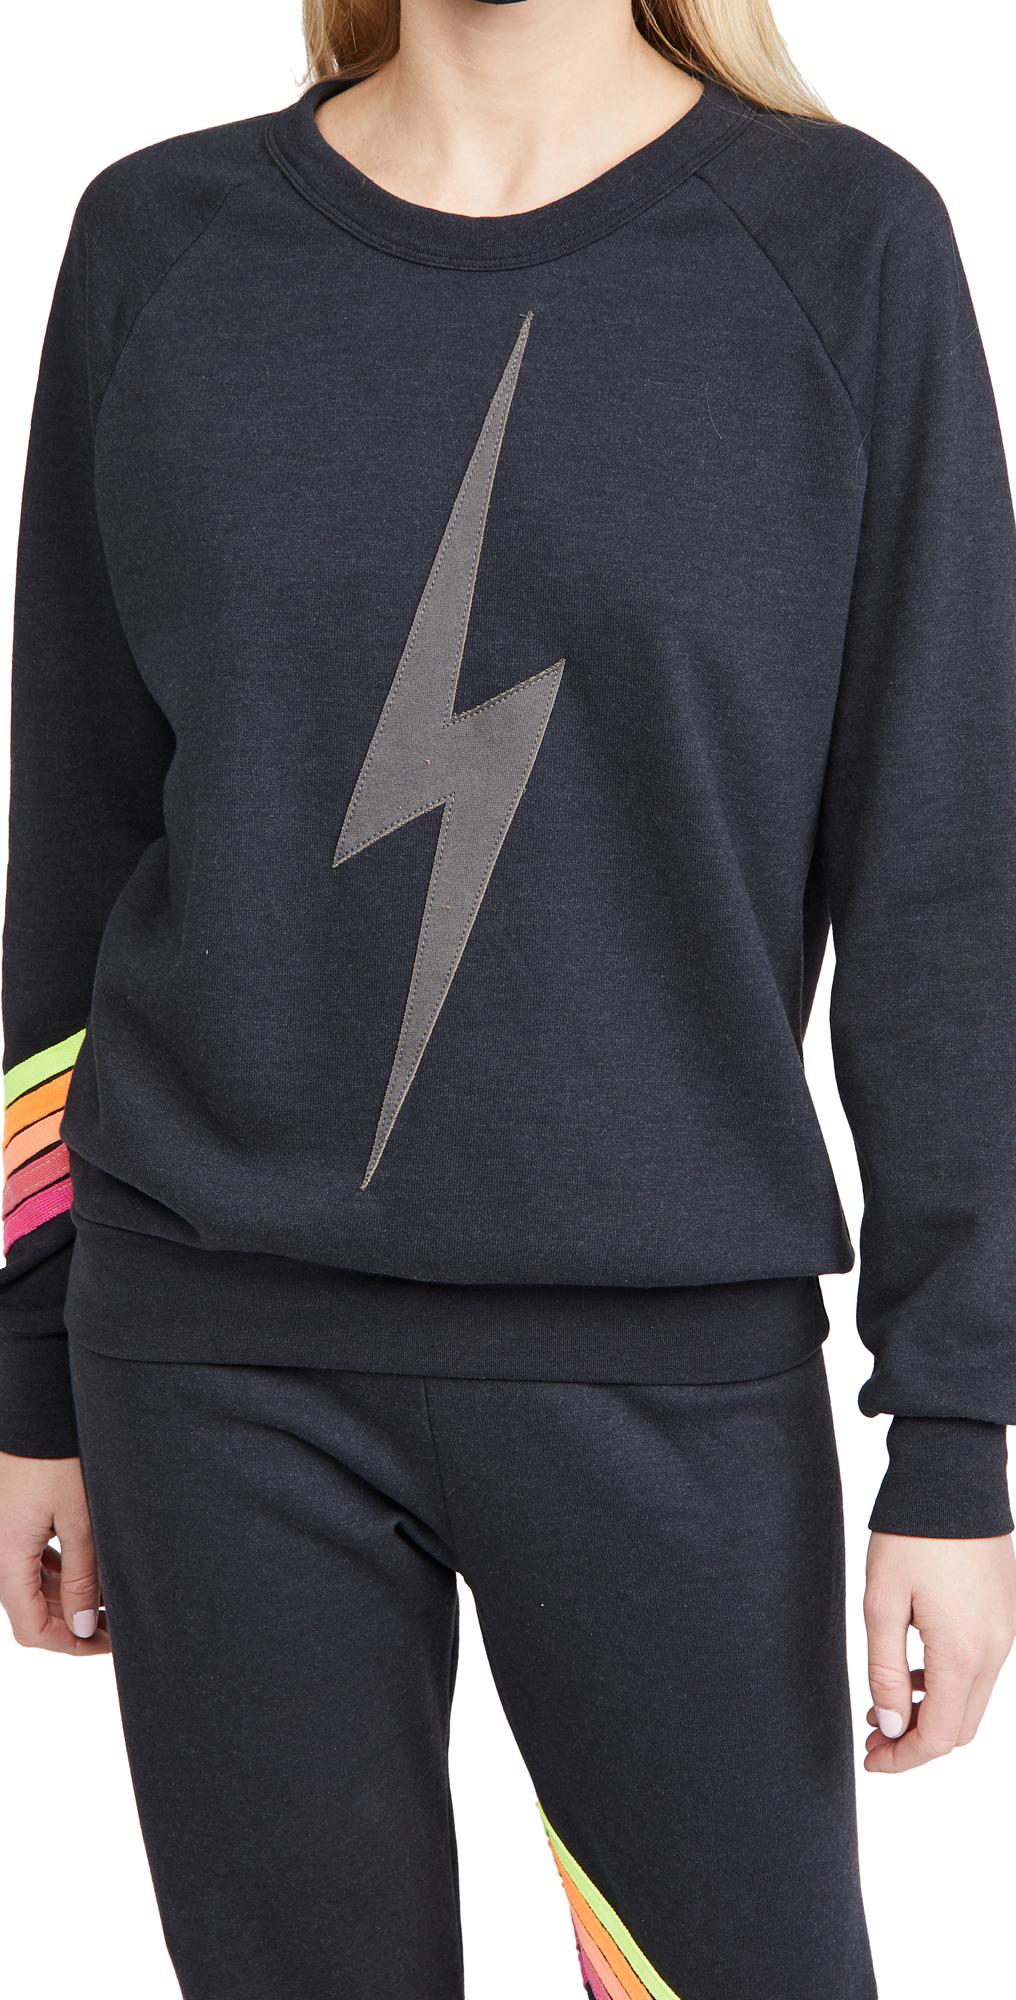 Aviator Nation Bolt Stitch Crew Sweatshirt